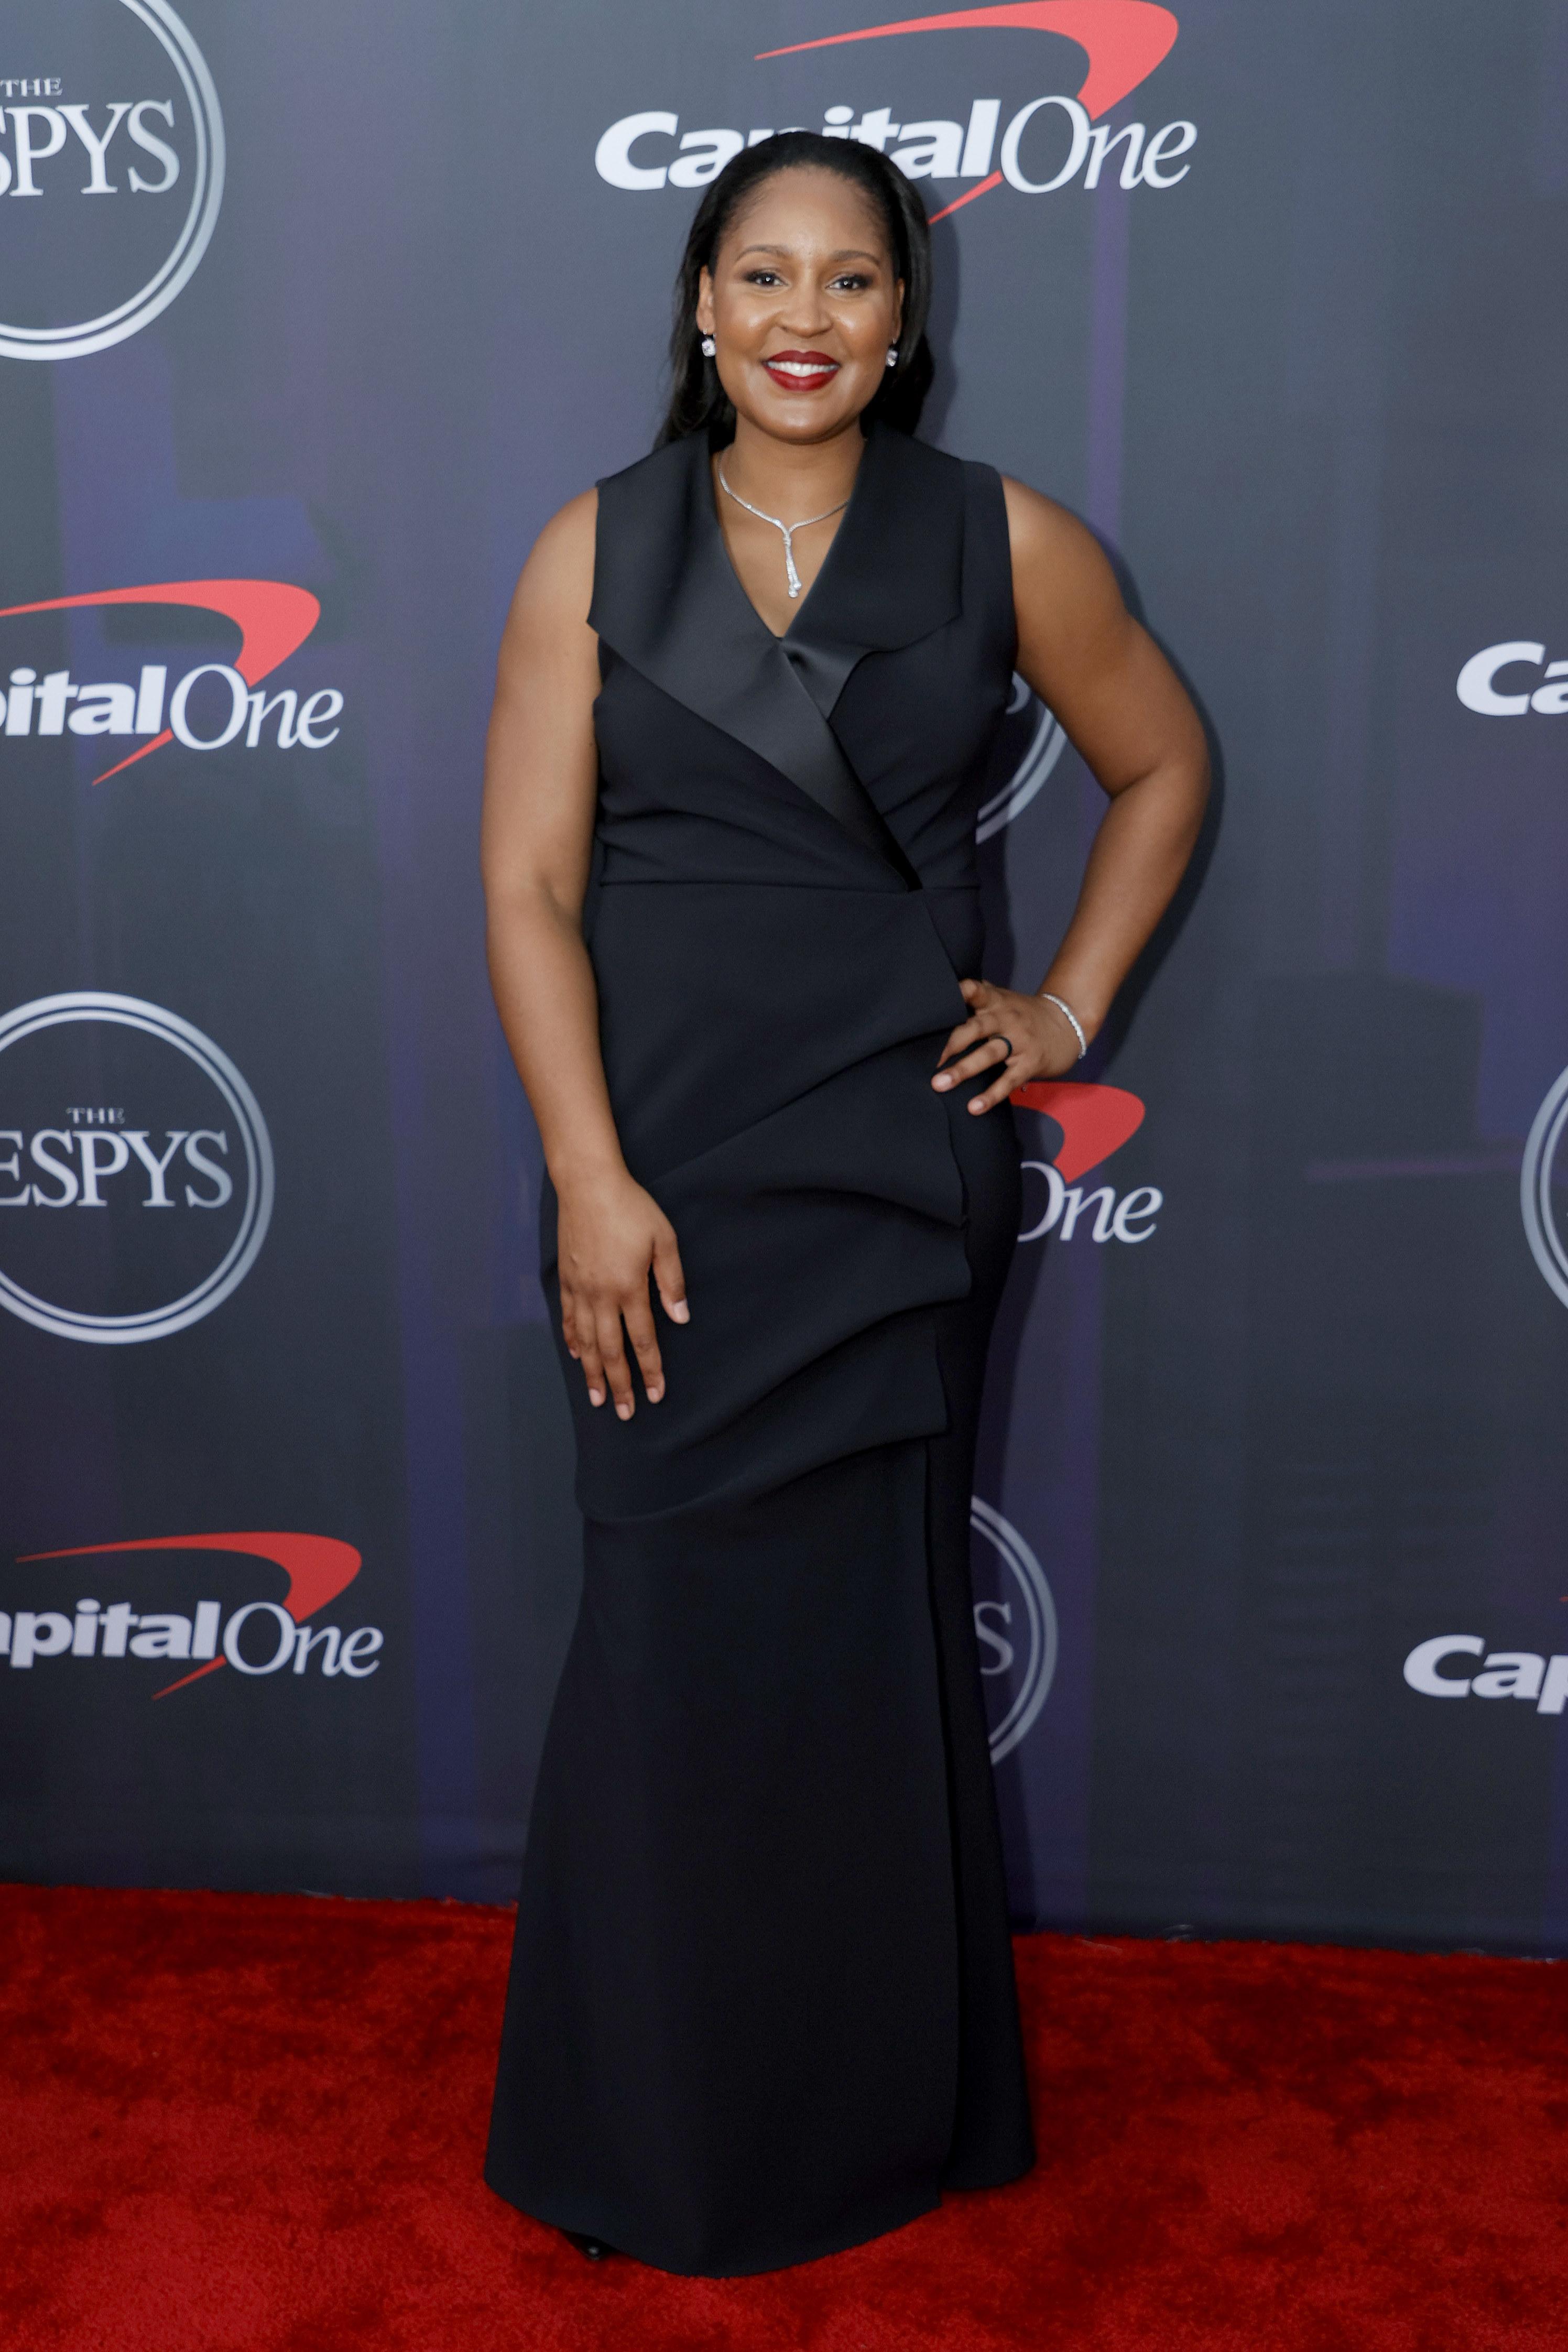 Maya wore a tuxedo gown